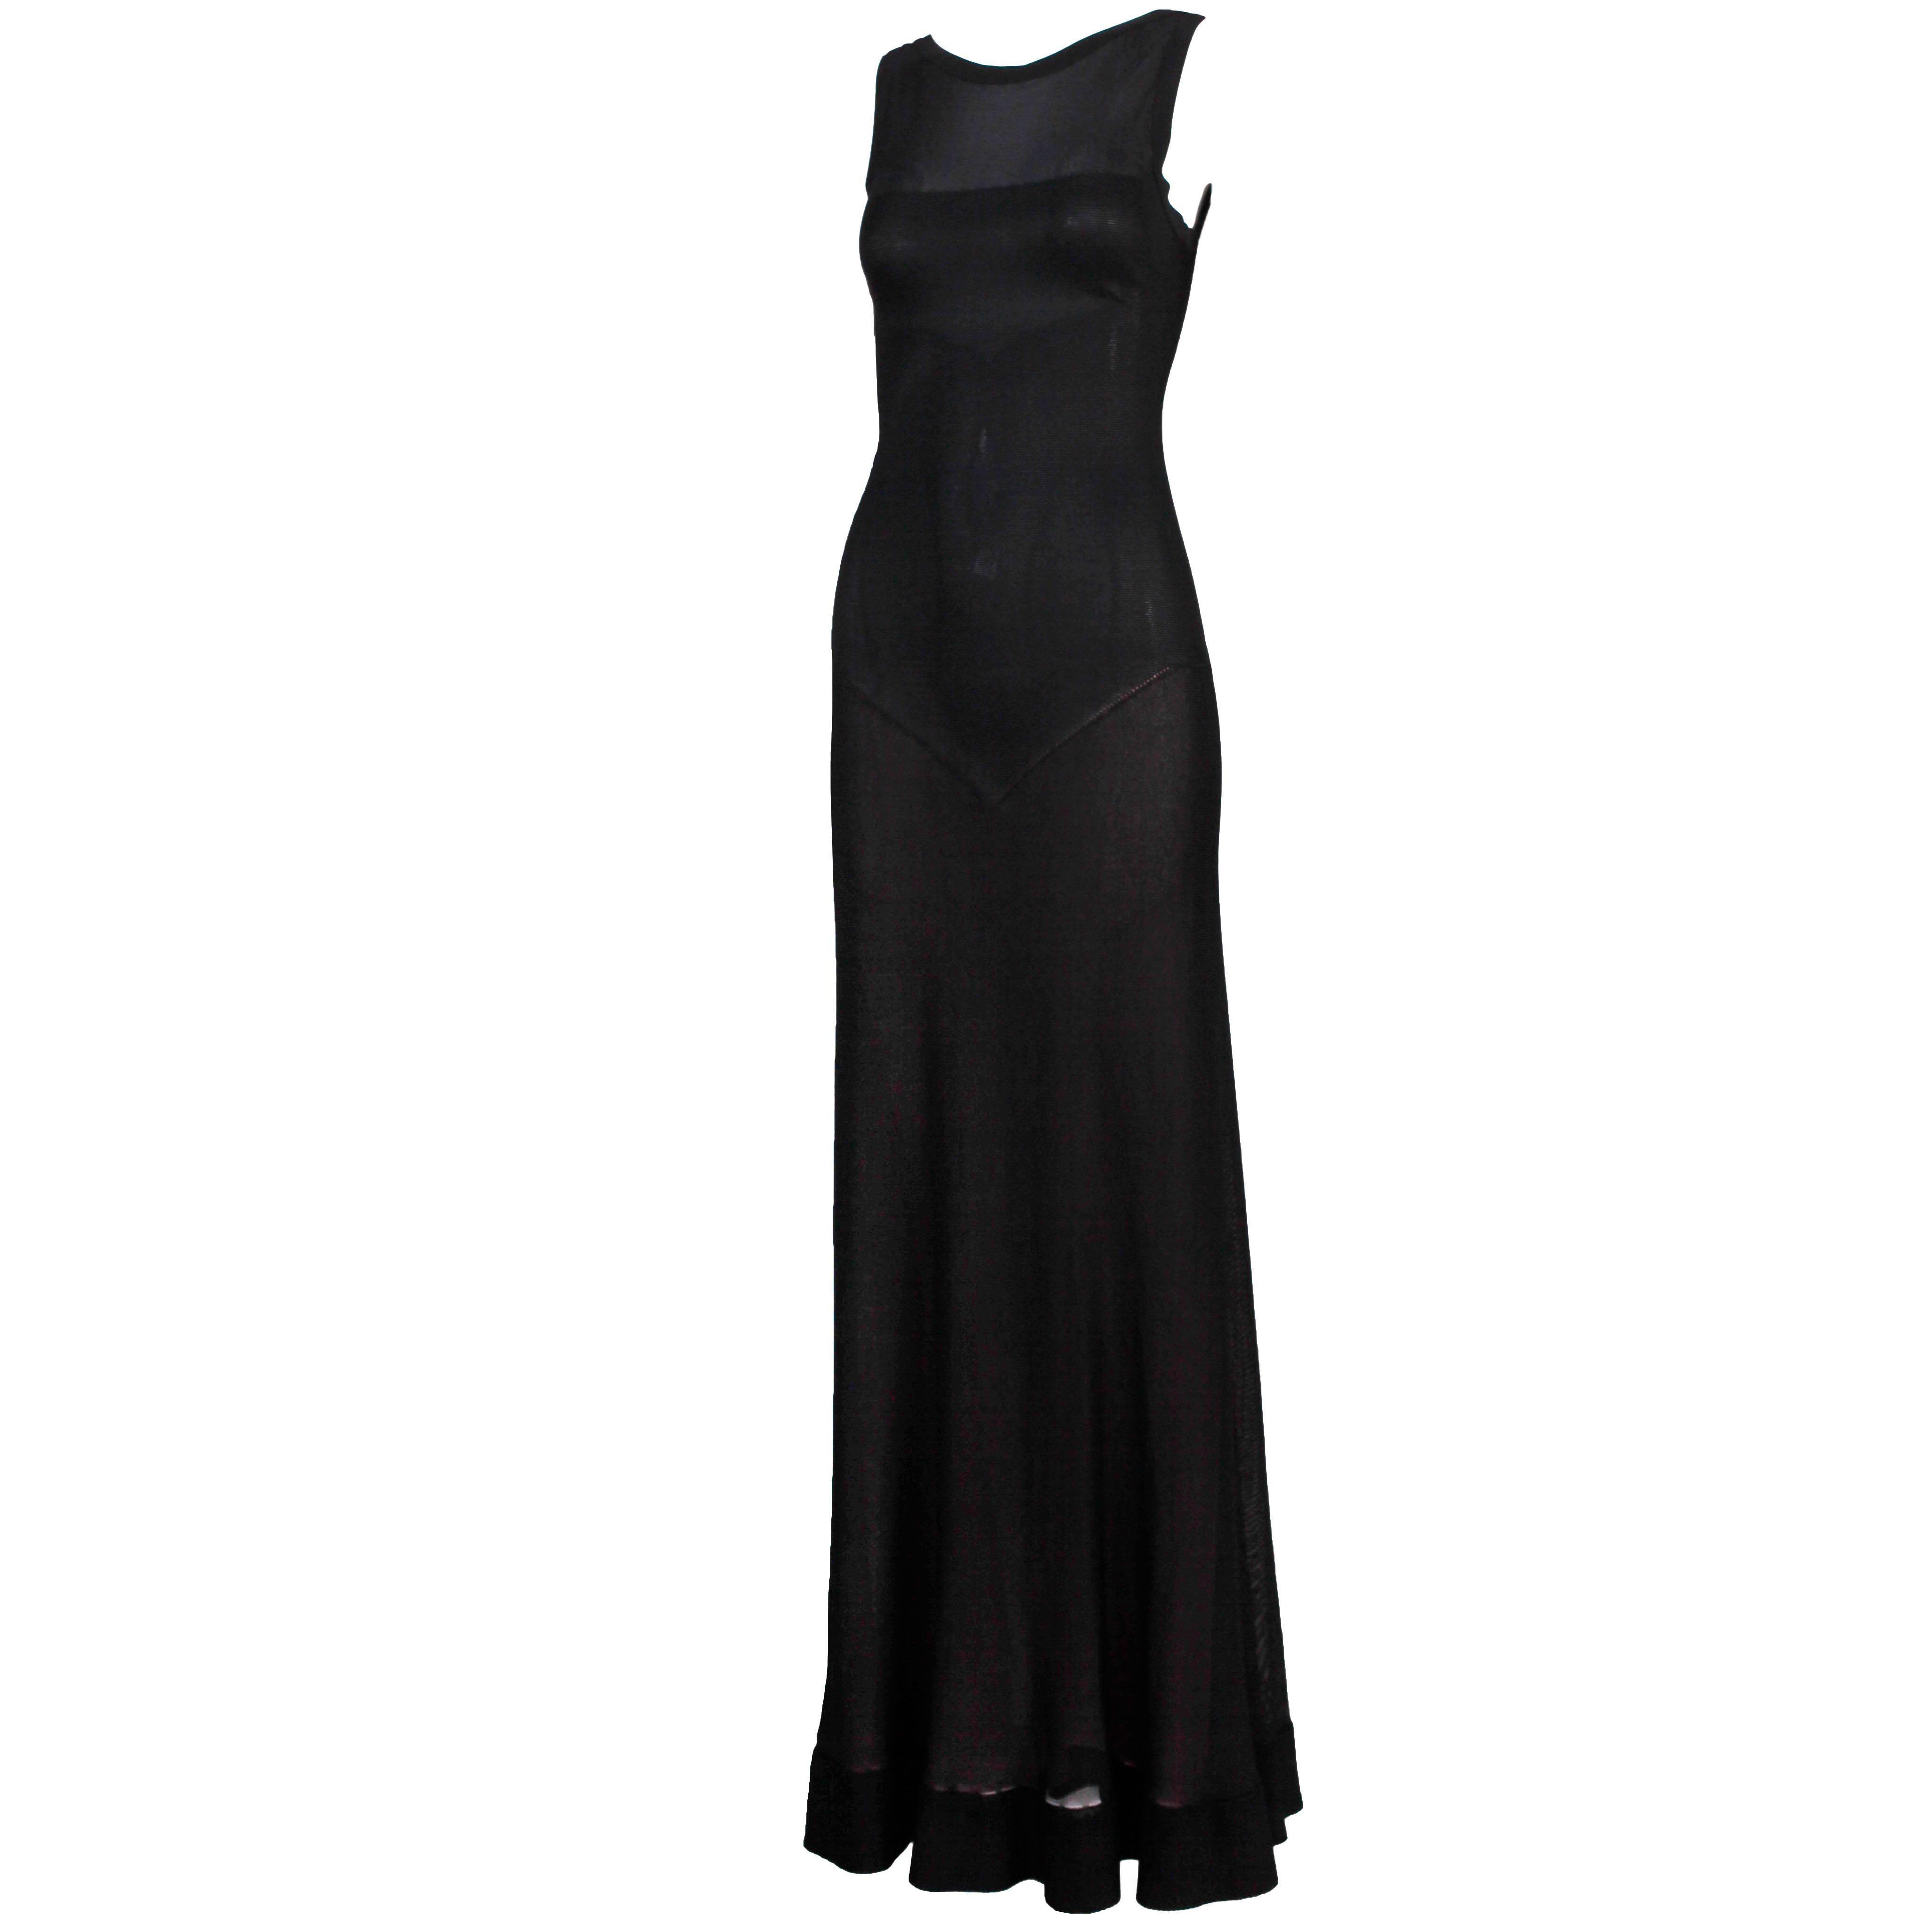 Circa 2005 Azzedine Alaia Black Evening Dress Gown